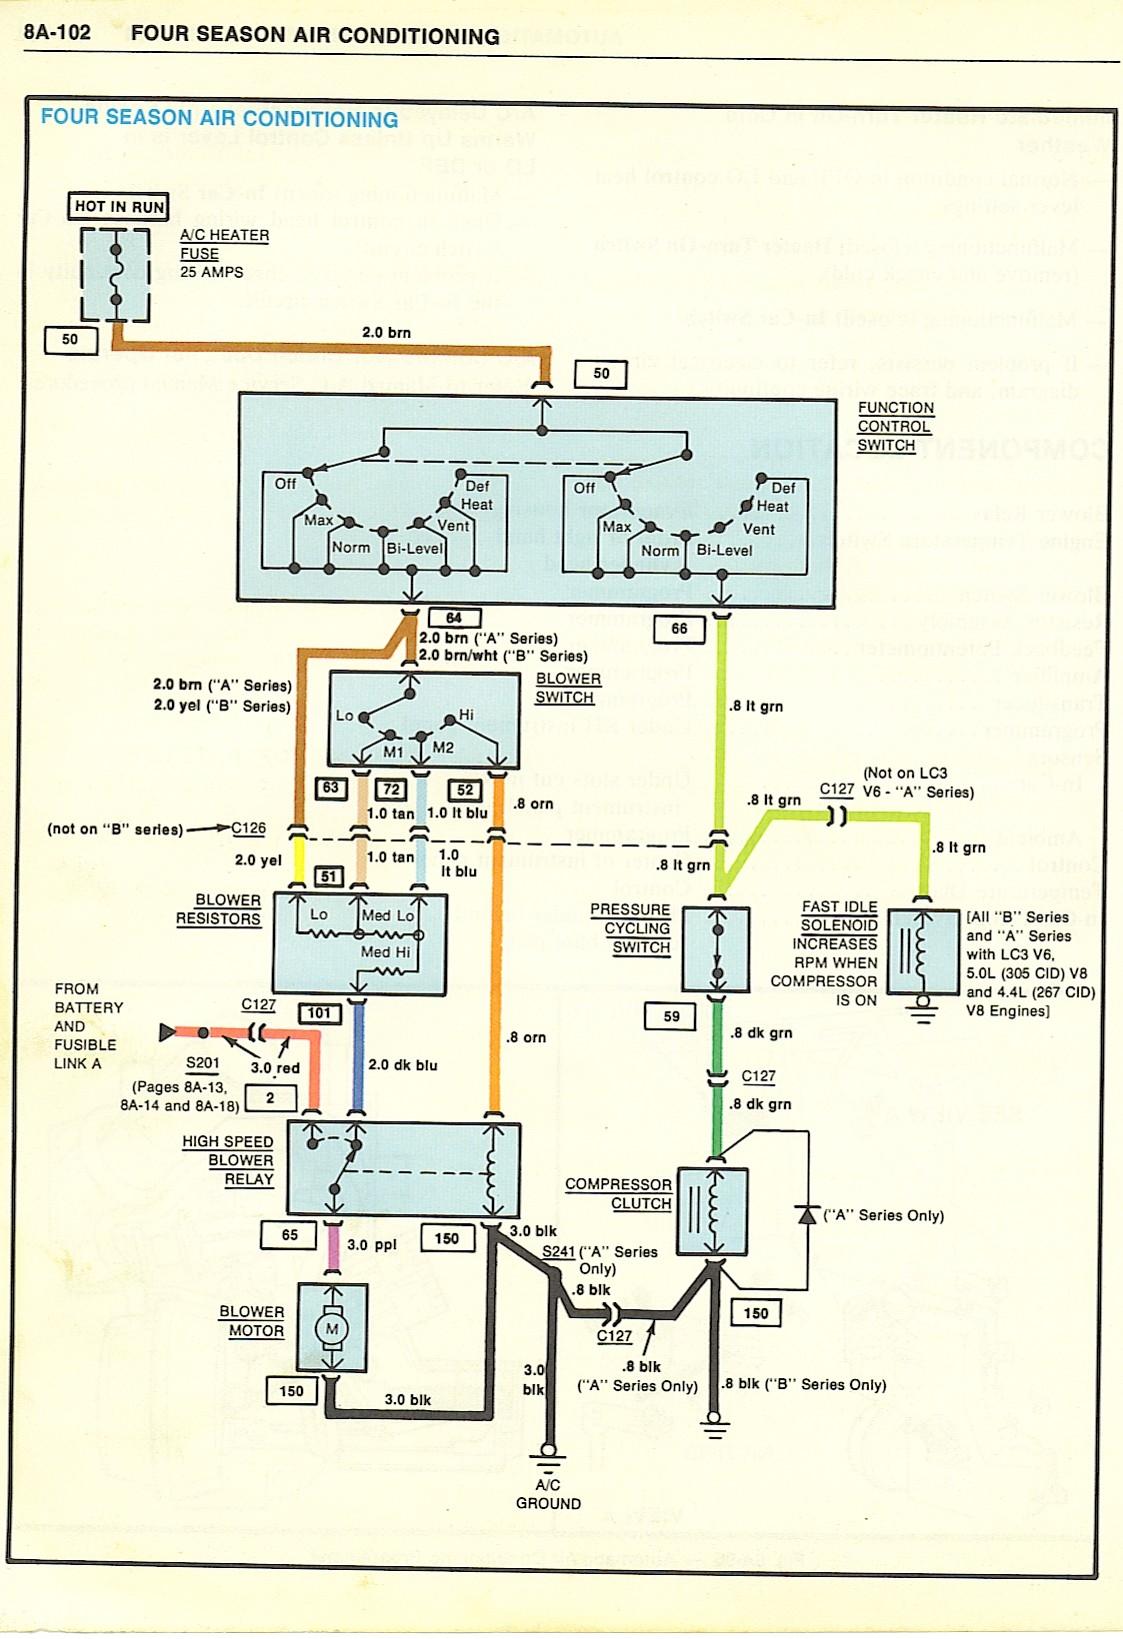 automotive hvac diagram 2004 honda odyssey wiring air conditioner schematic pdf library 1968 camero a c drawing